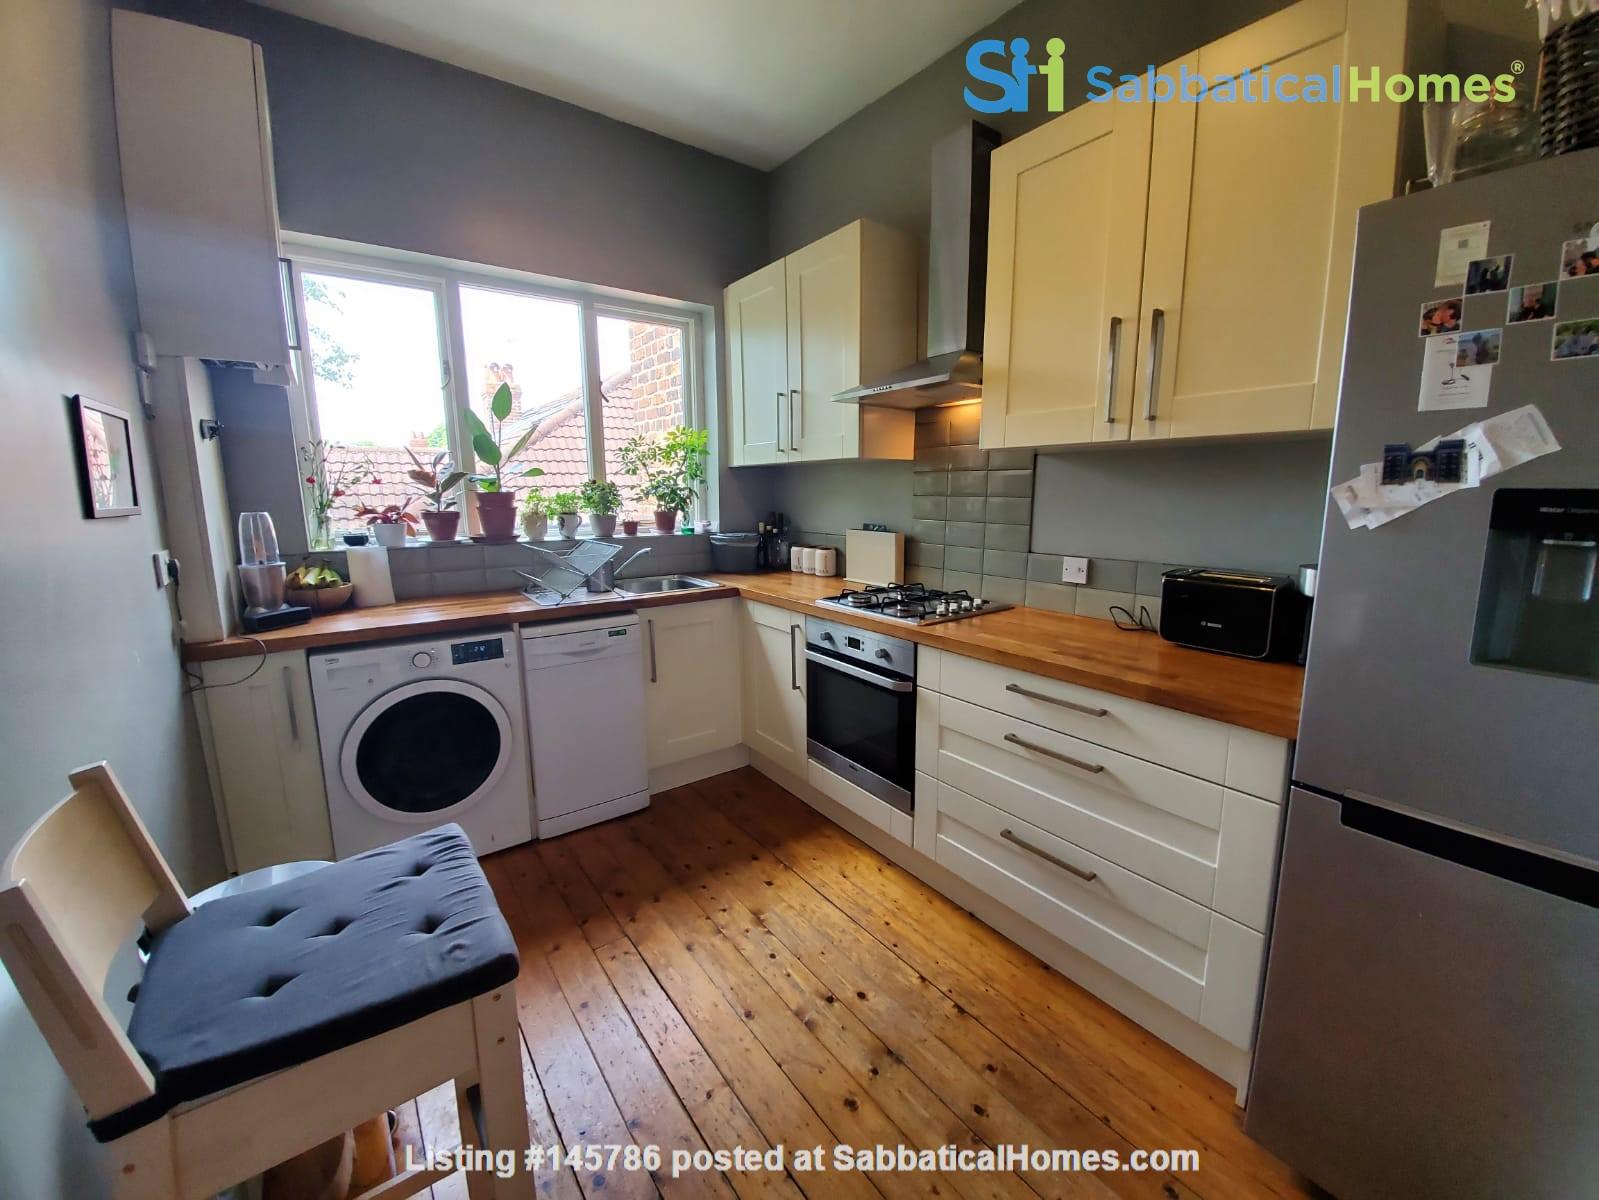 Manchester UK: Spacious, Quiet, Sunlight Filled Flat in Great Neighbourhood Home Rental in  5